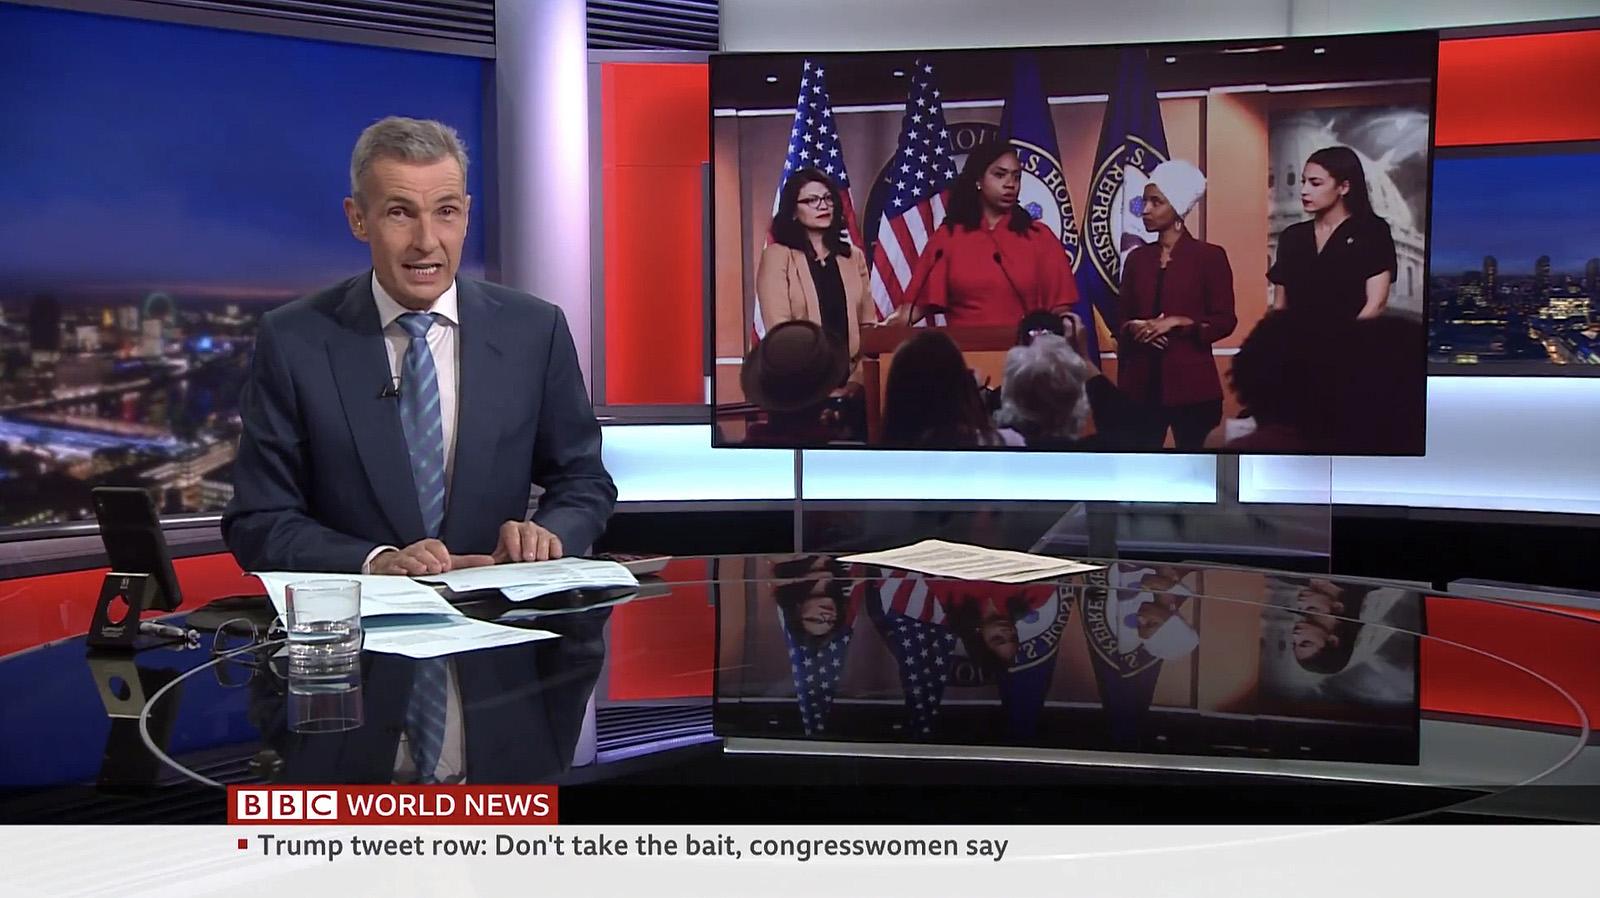 NCS_BBC-Rebrand-Reith-2019_025